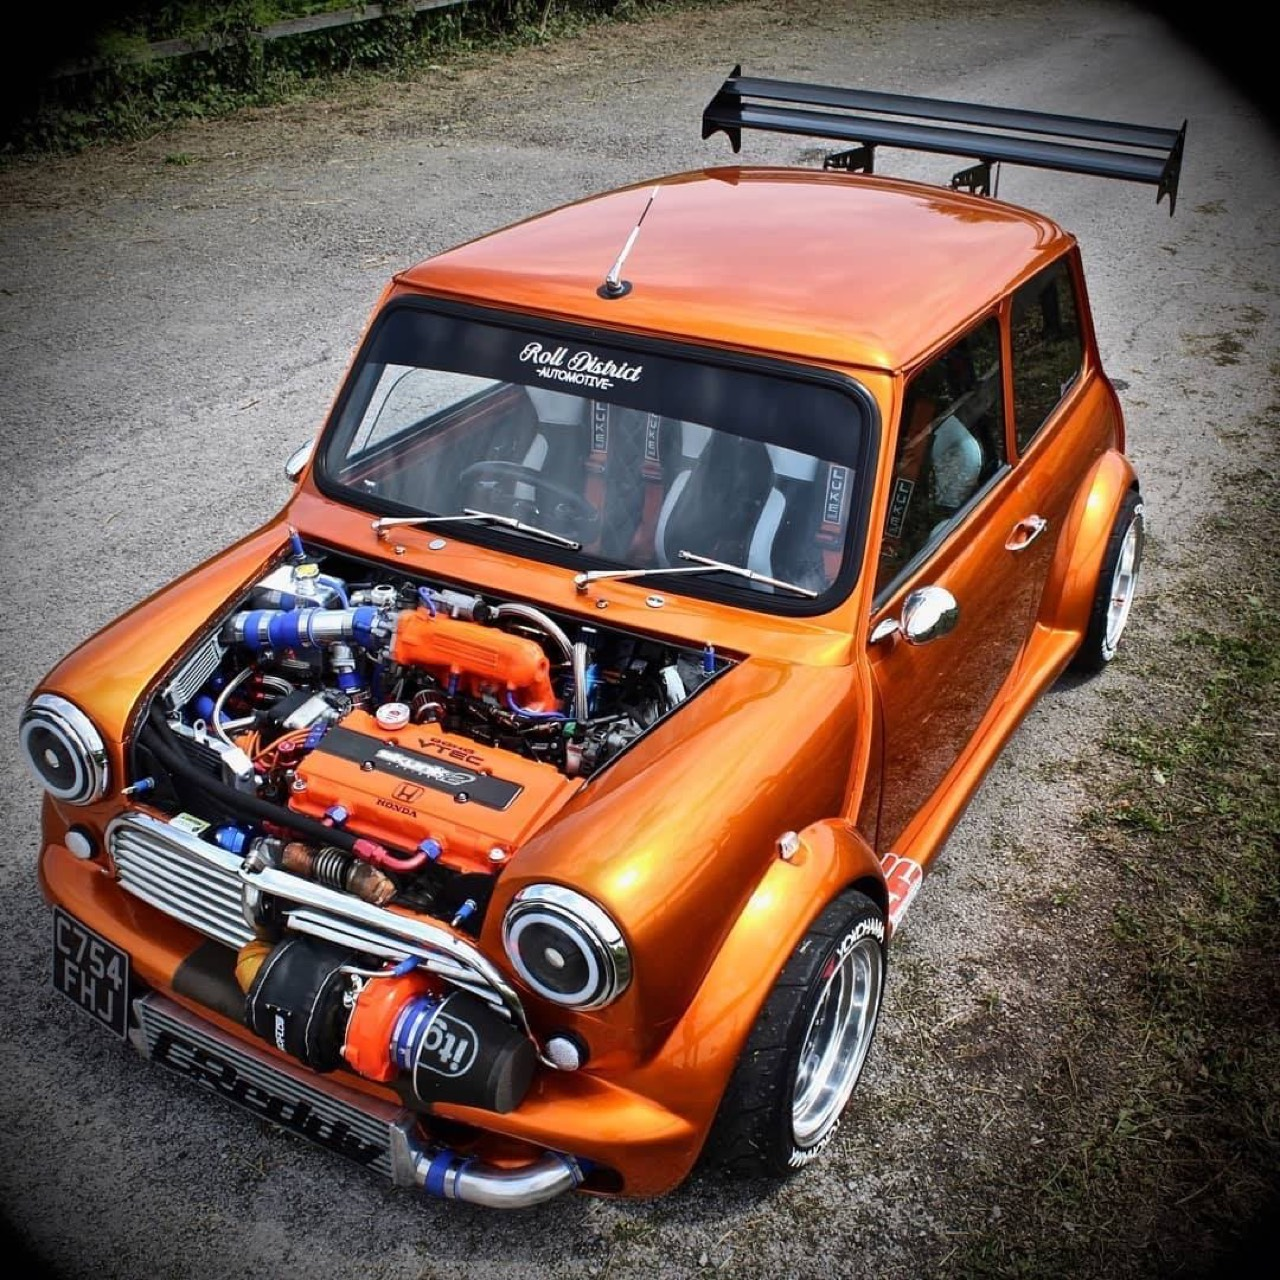 Austin Mini B16 Turbo... Shootée aux hormones ! 16